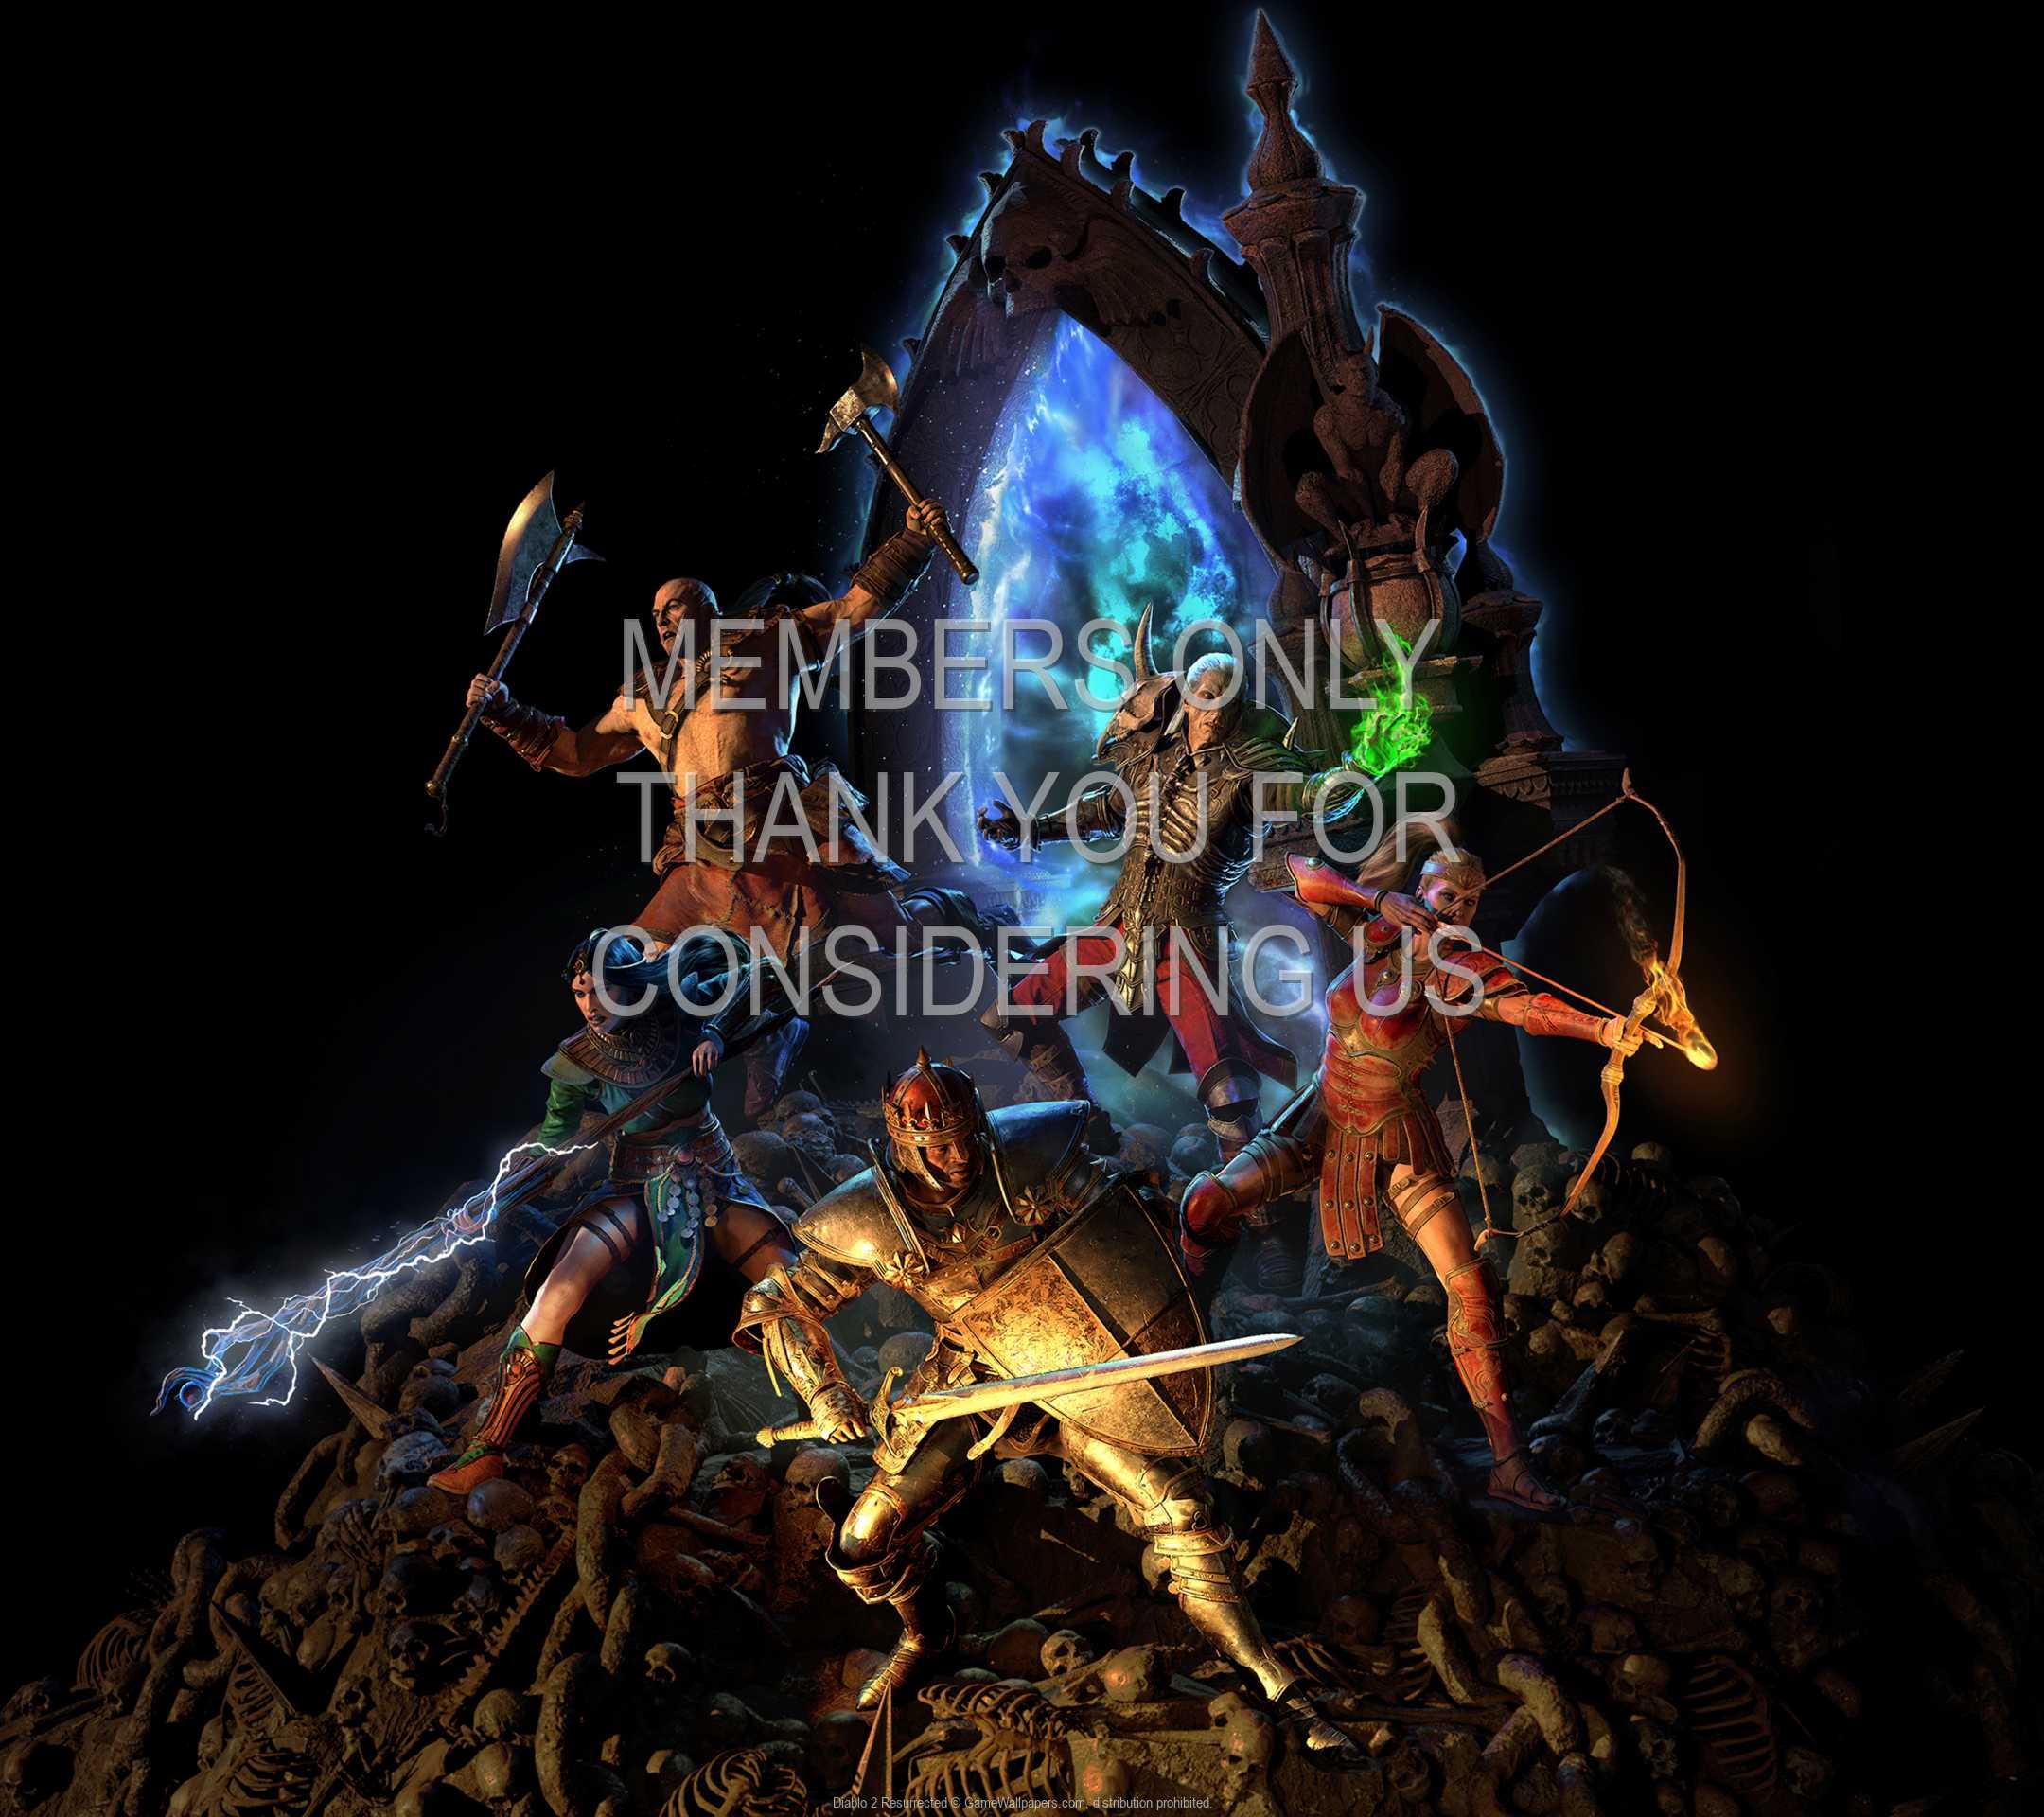 Diablo 2: Resurrected 1080p Horizontal Mobile wallpaper or background 07